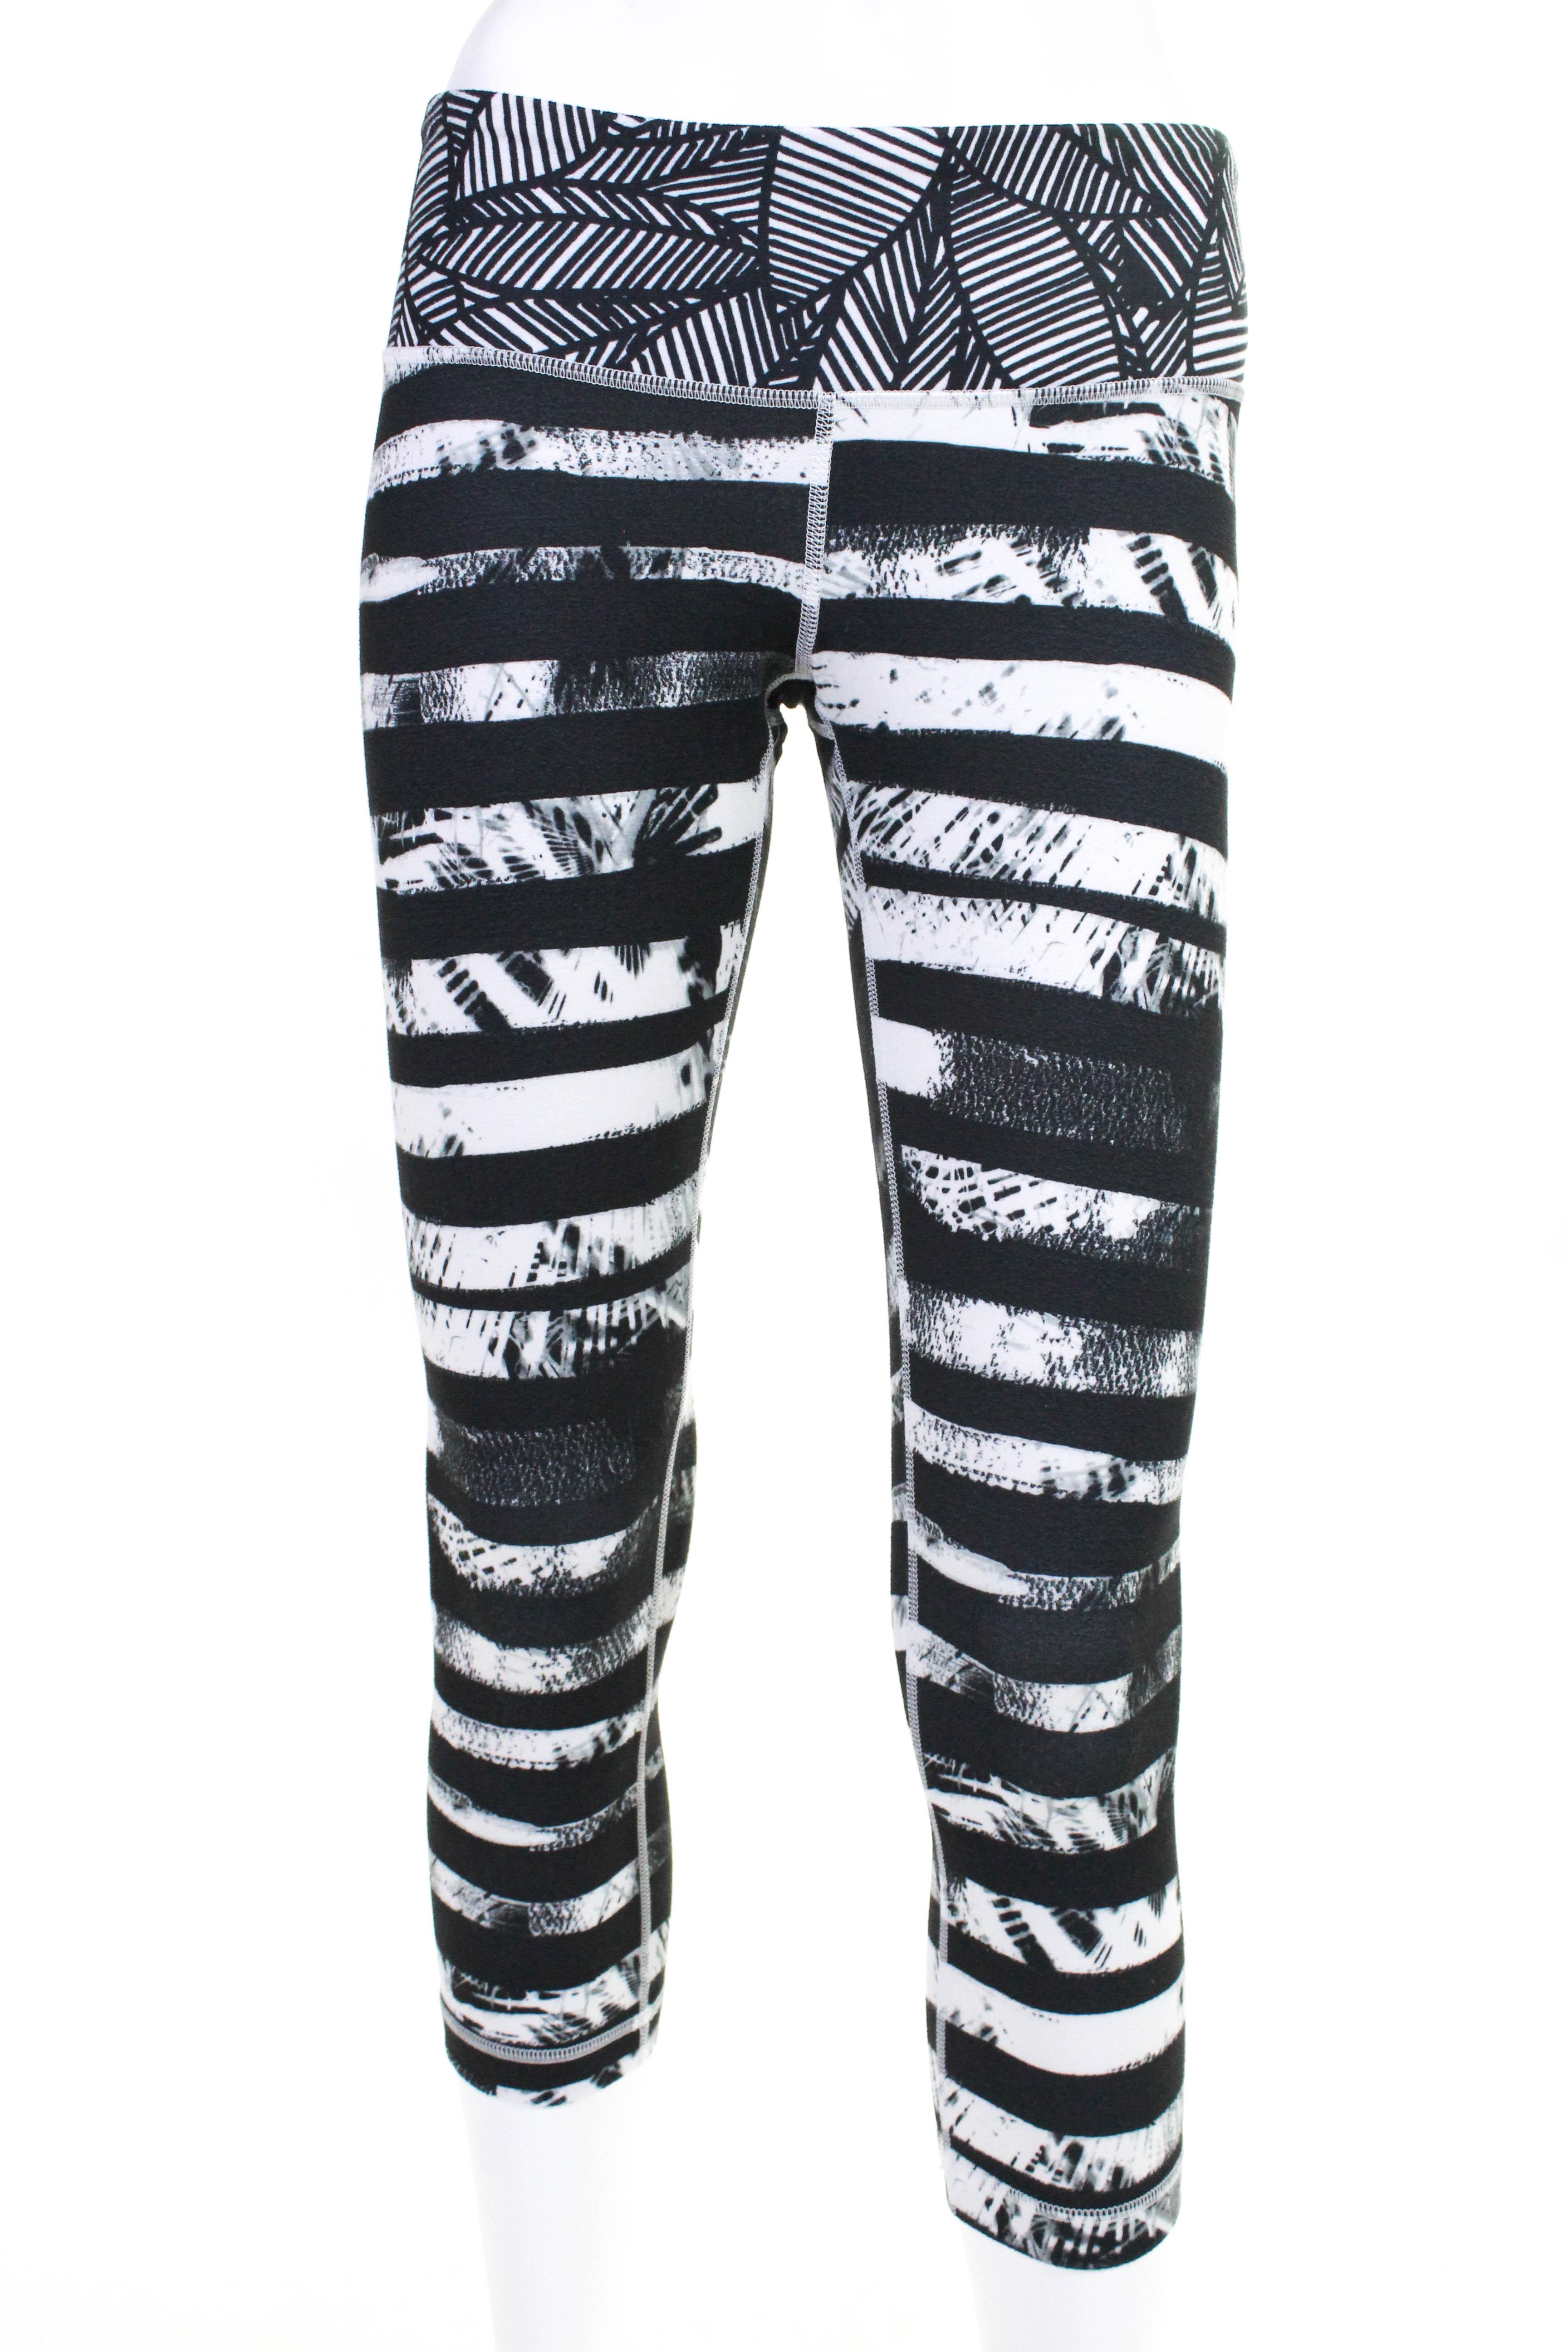 09b9c898a8 Lululemon Womens Crop Athletic Leggings Gray Black Size 6 | eBay